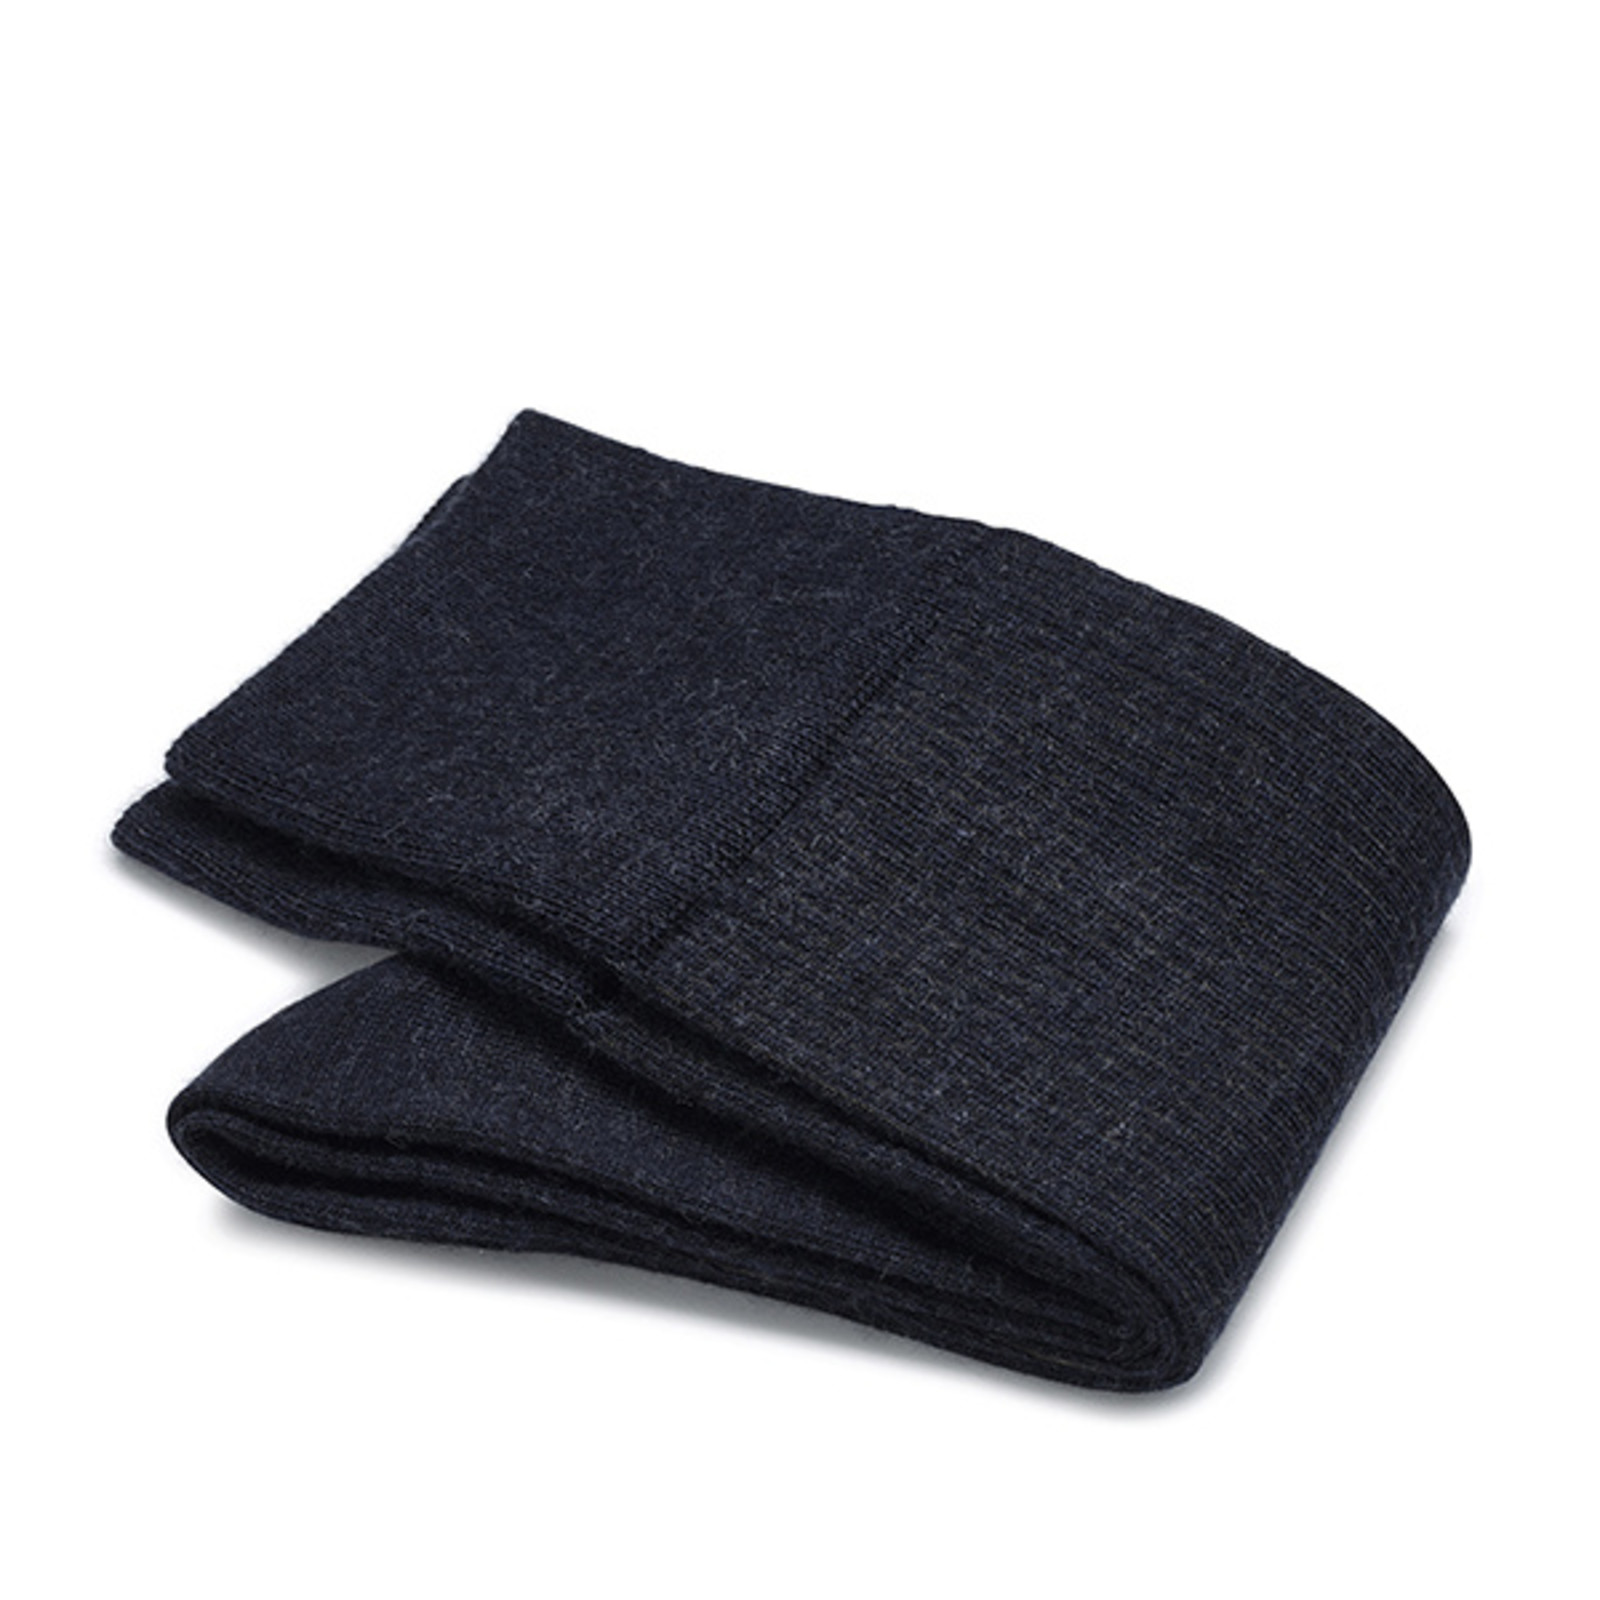 Carlo Lanza Denim shadow socks